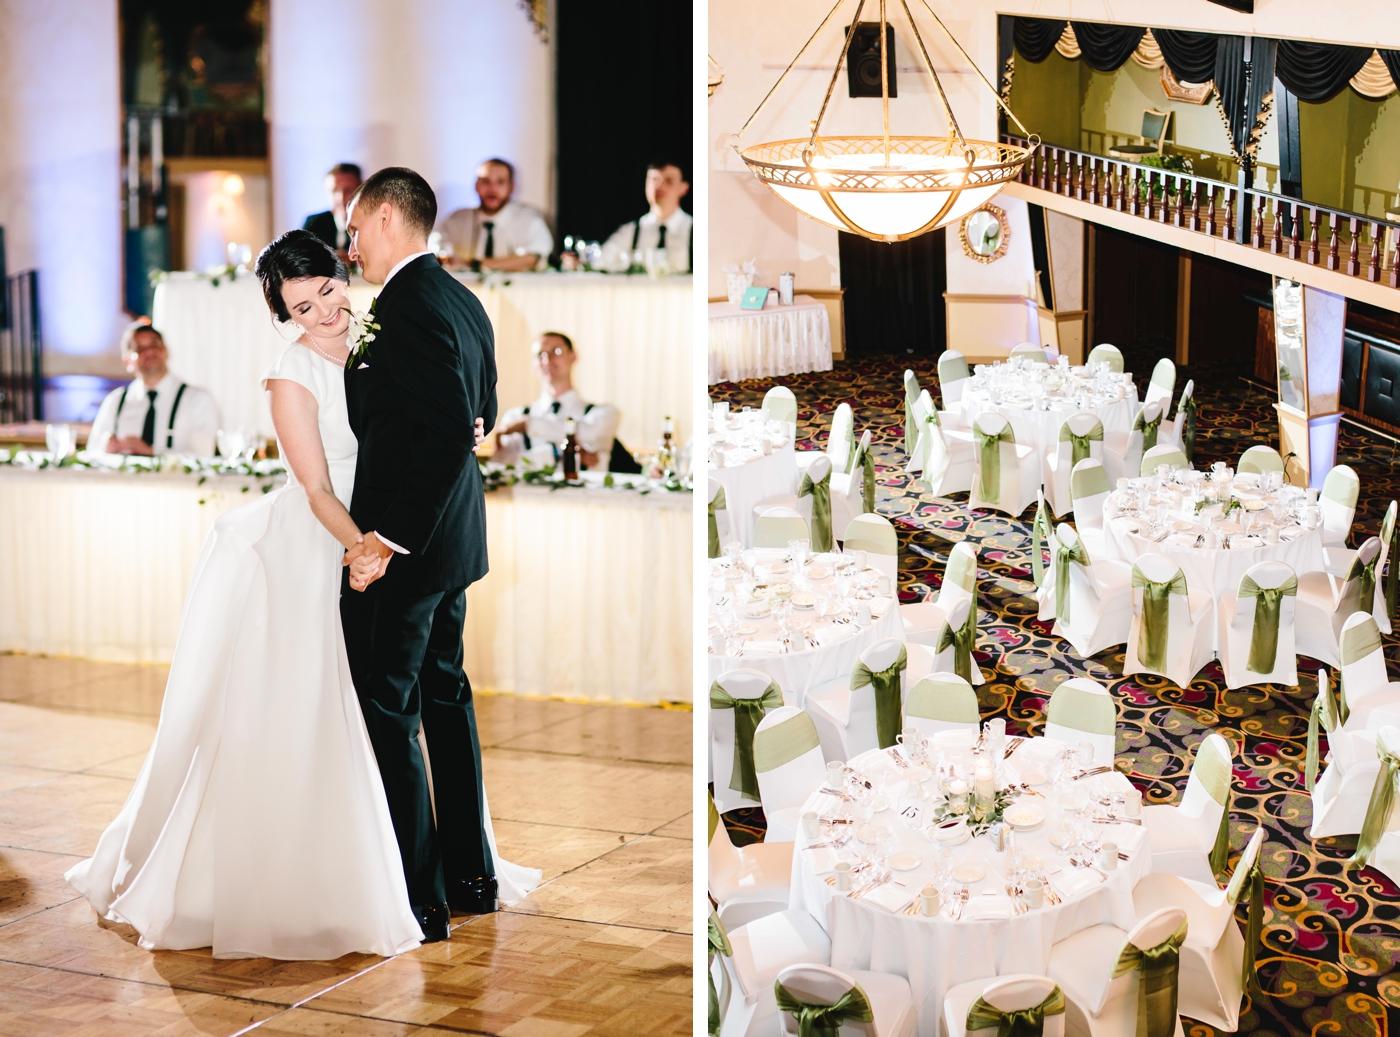 chicago-fine-art-wedding-photography-mccarthy62